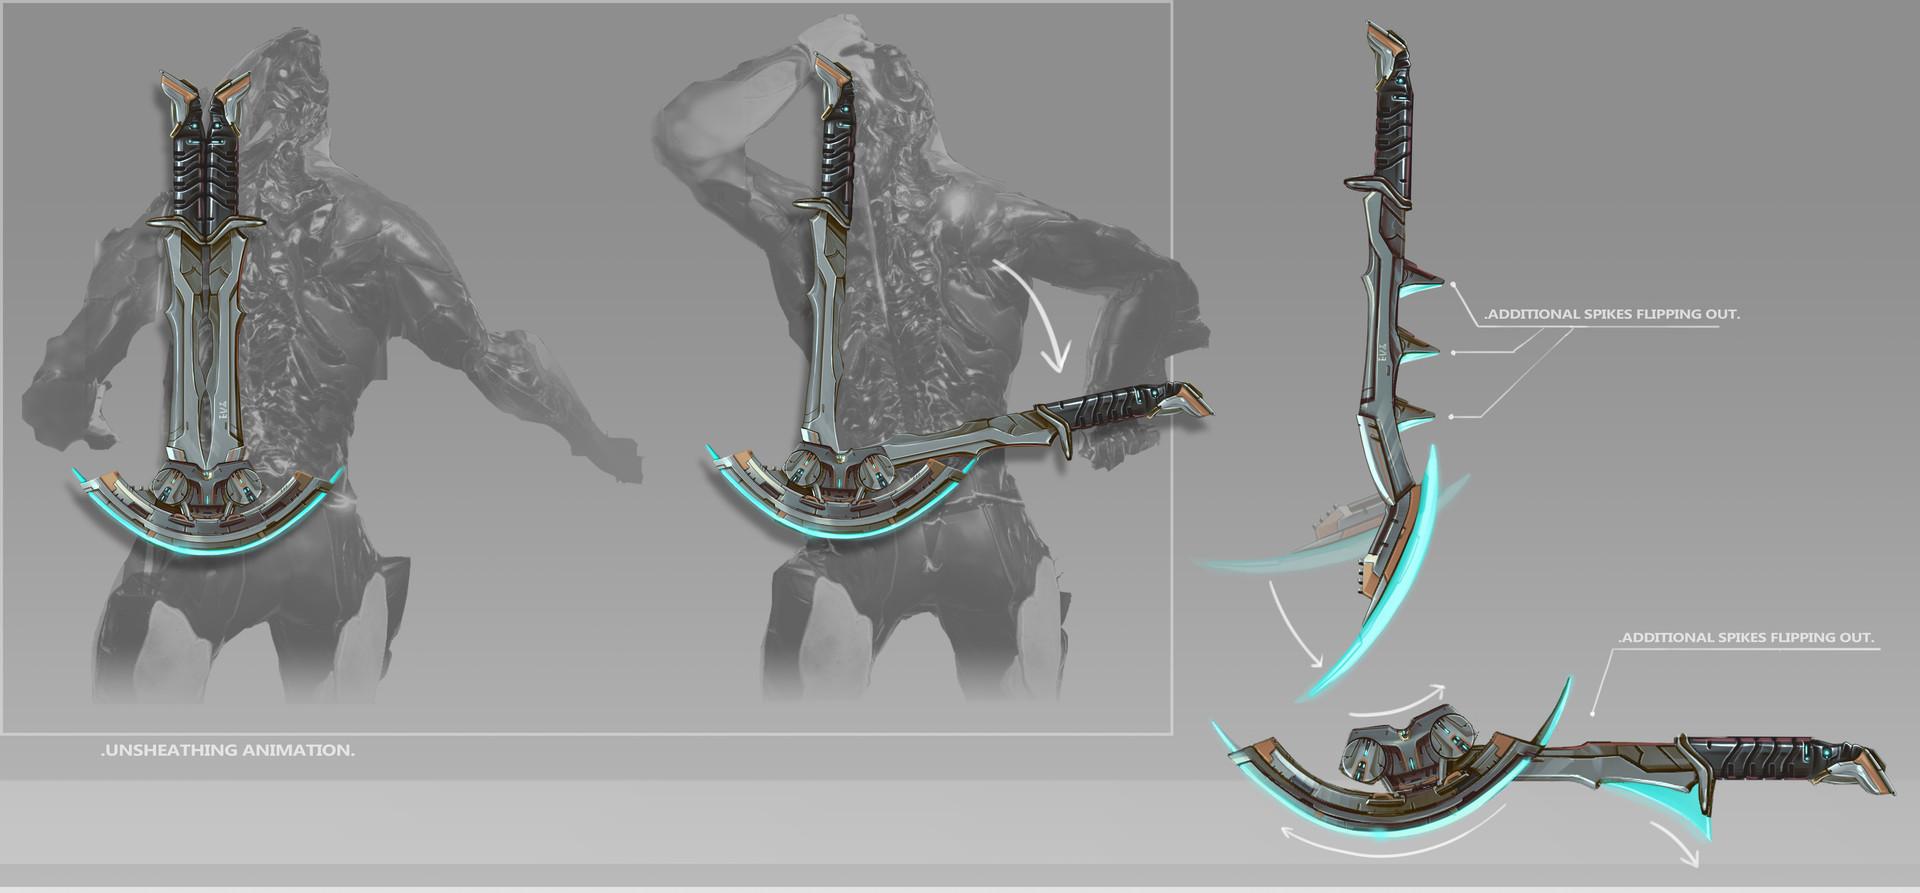 Marco hasmann corpus sword unsheathing